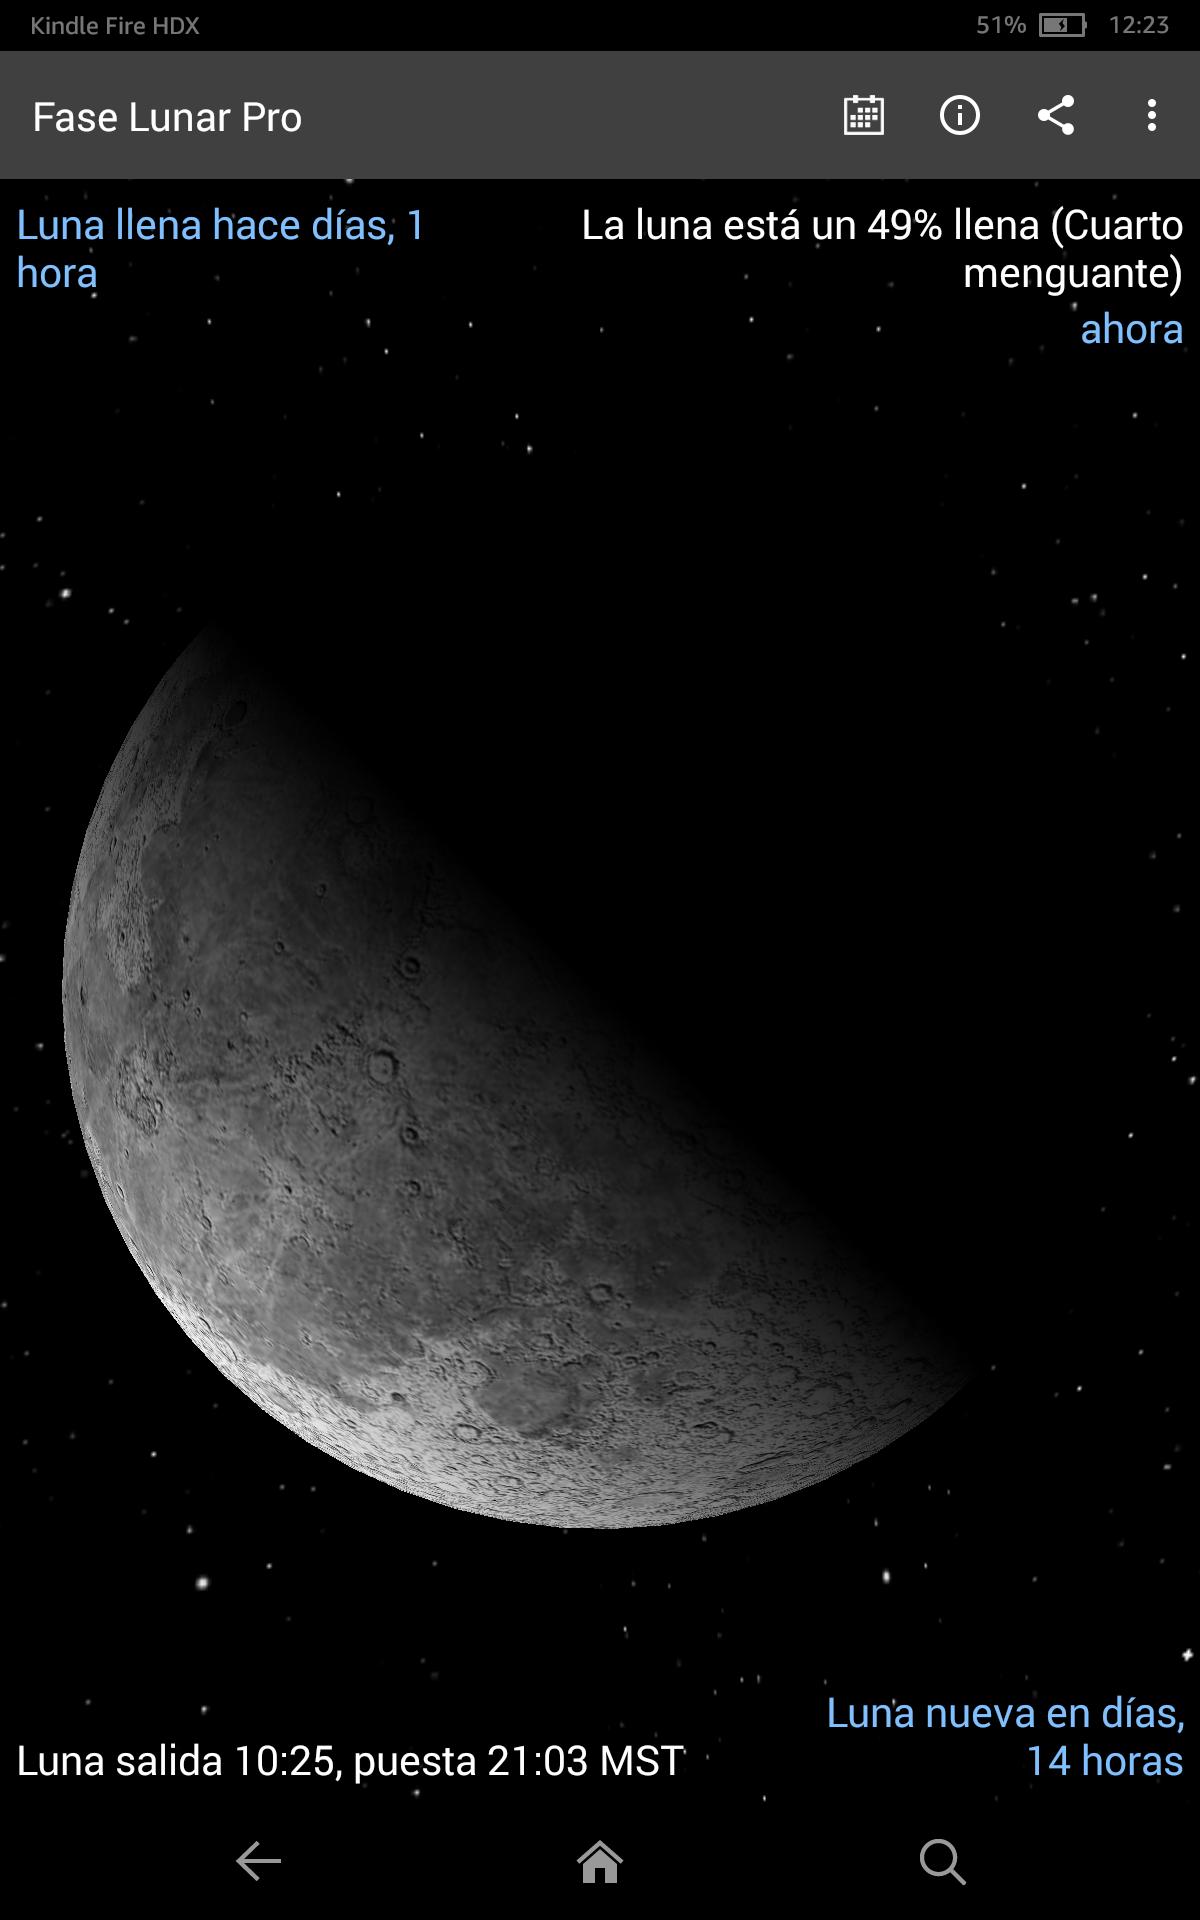 Fase Lunar Pro + Eclipses Lunar: Amazon.es: Appstore para Android